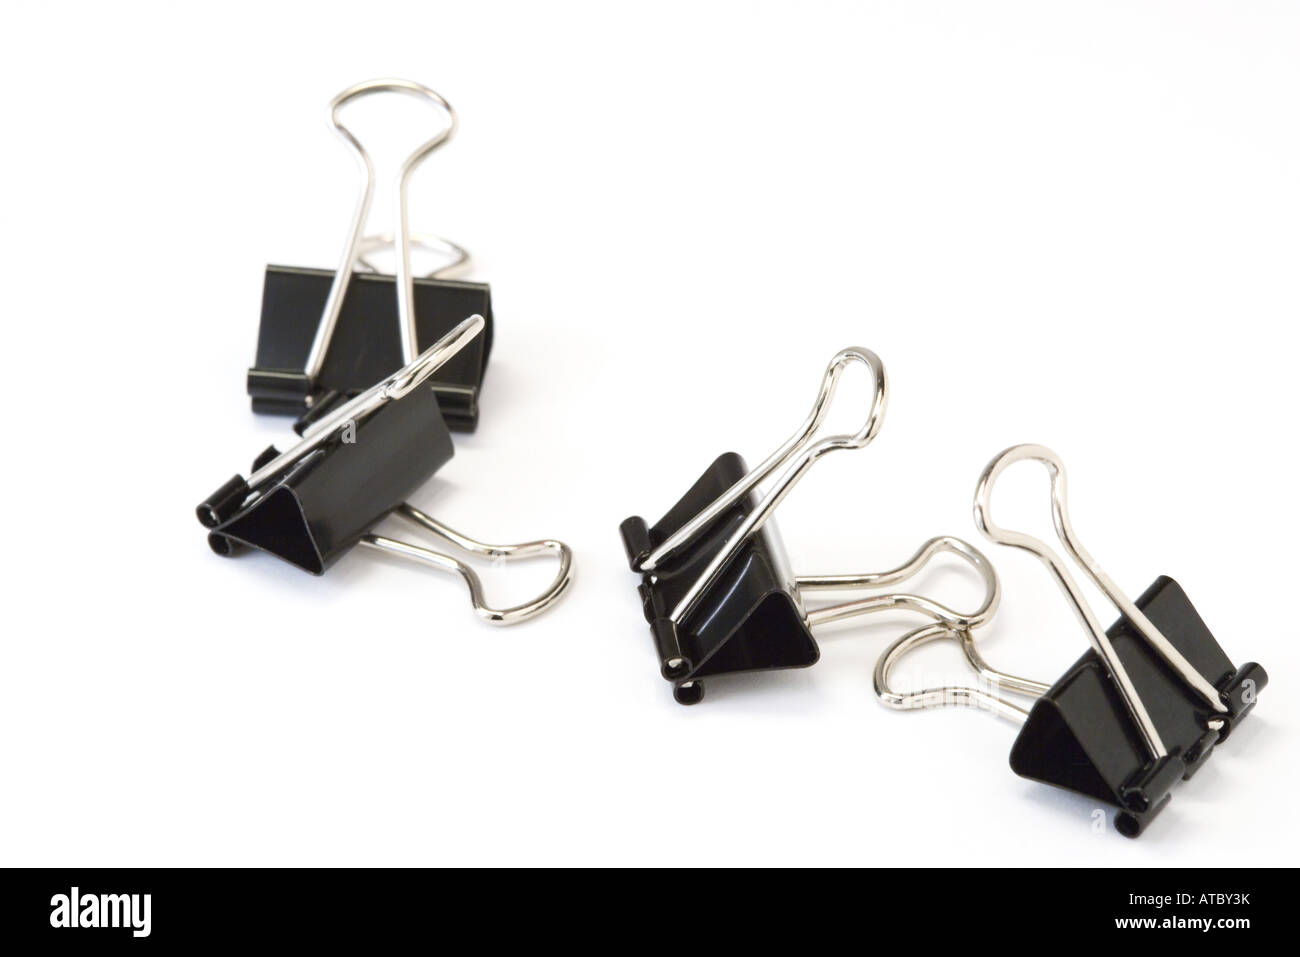 Binder clips, close-up - Stock Image